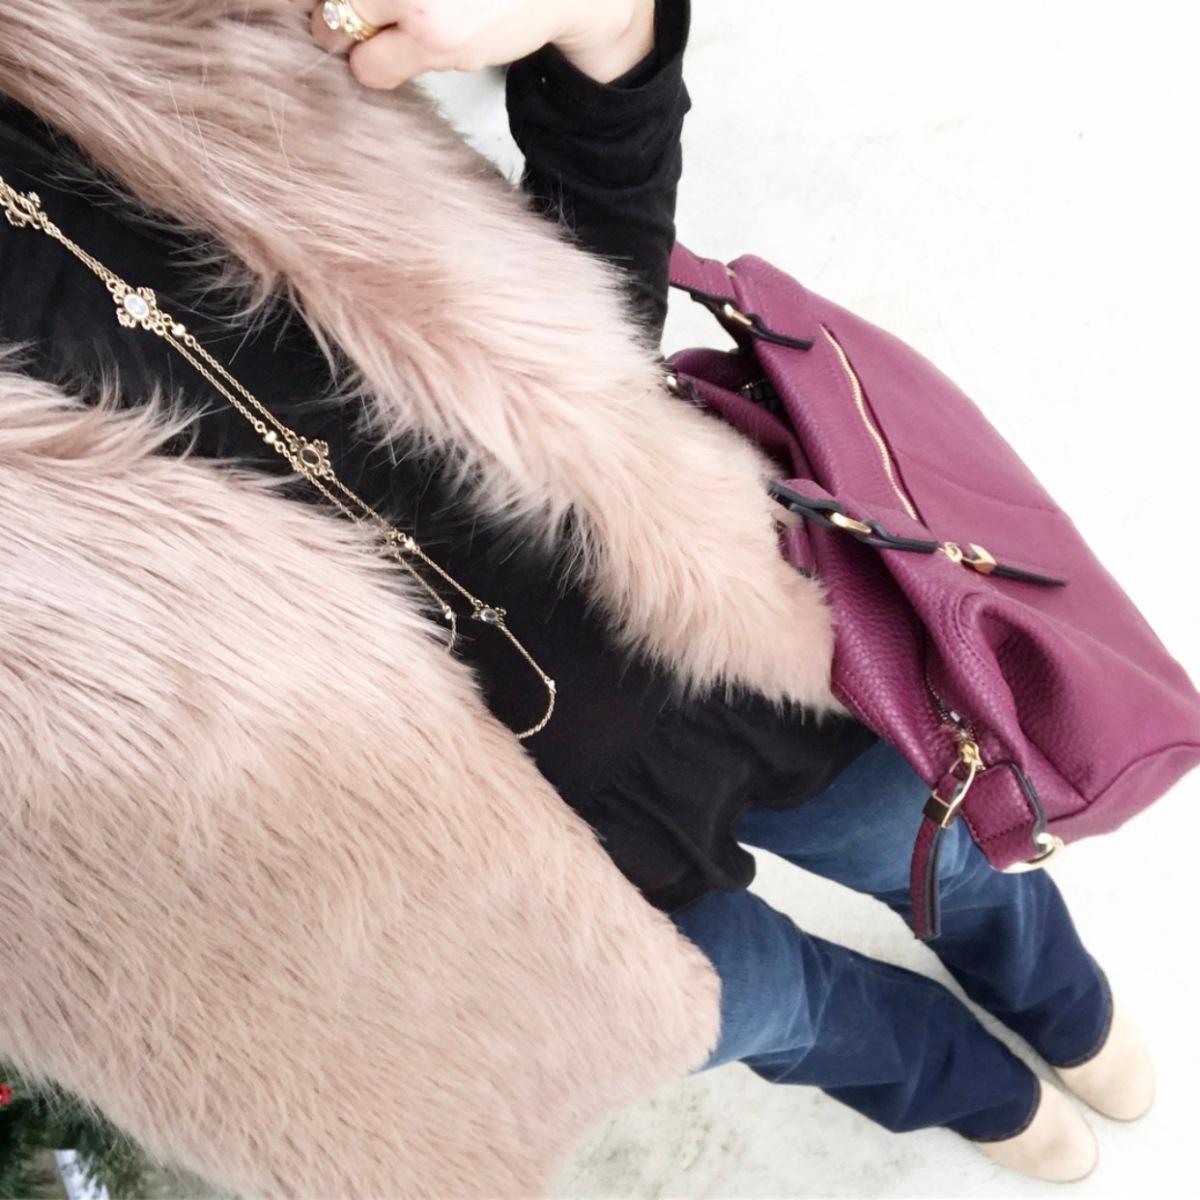 faux fur, peplum, and bootcut jeans |www.pearlsandsportsbras.com|